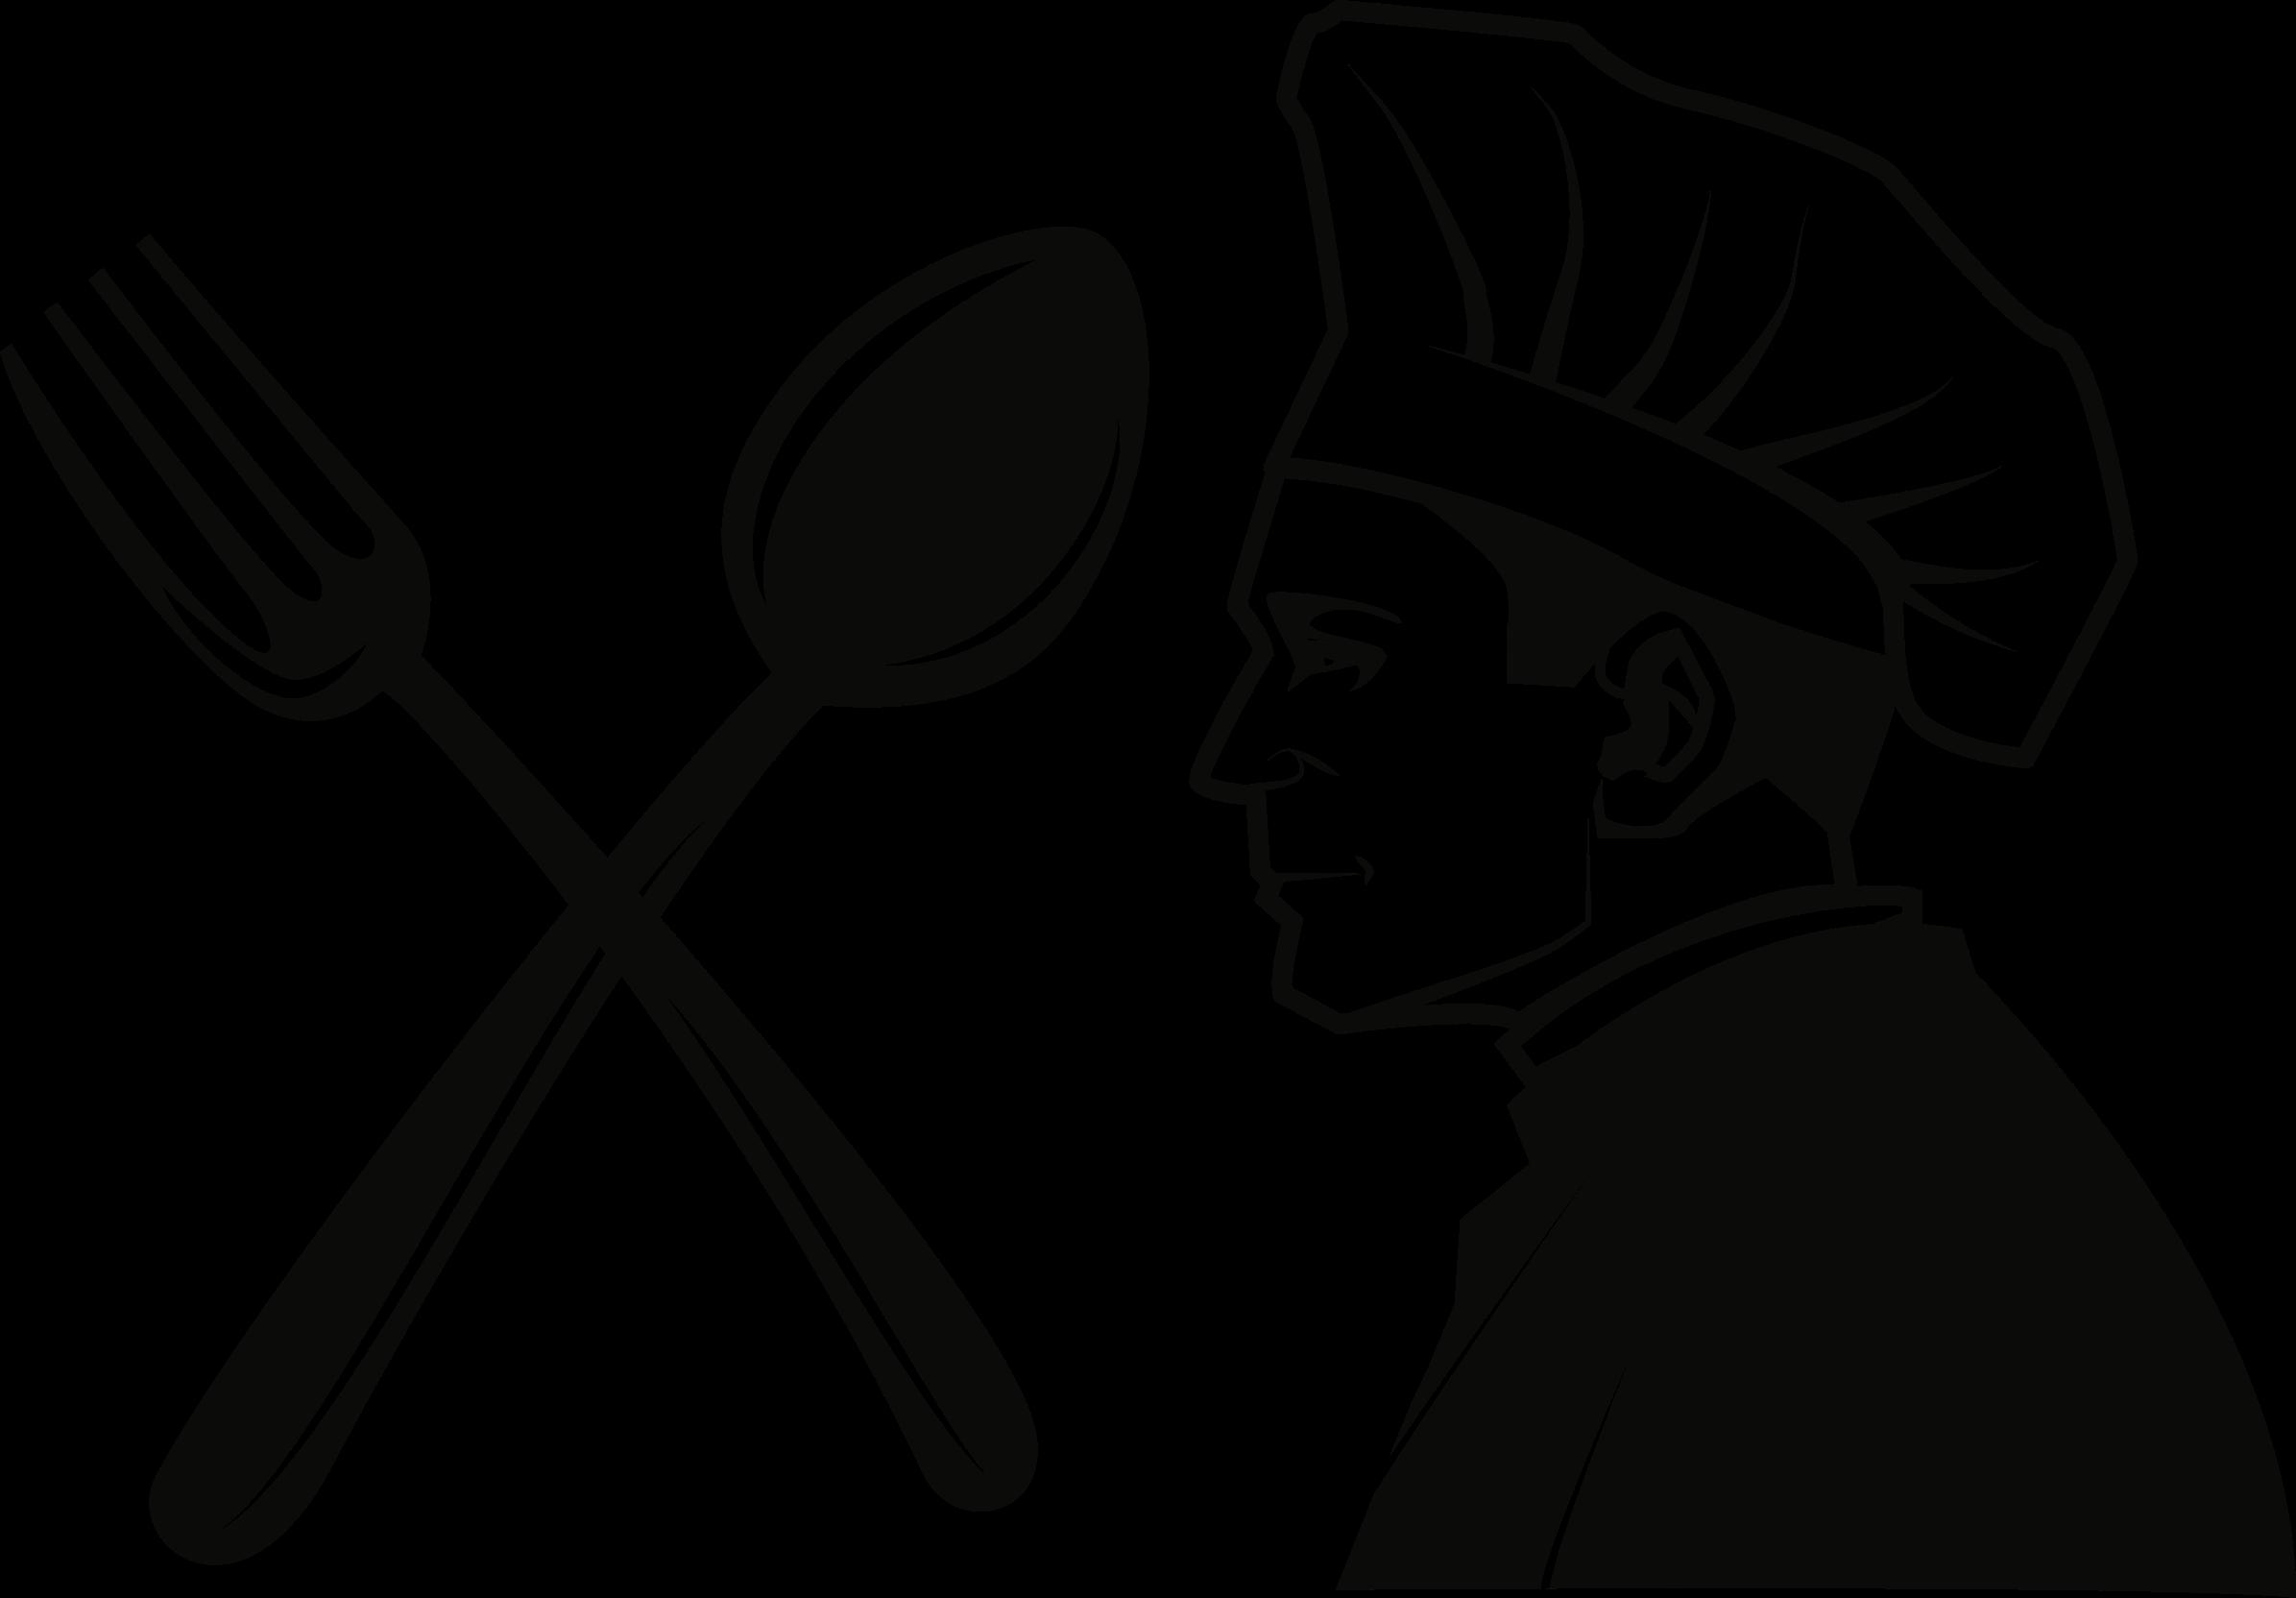 якутия повар логотип картинка хорошим ремонтом